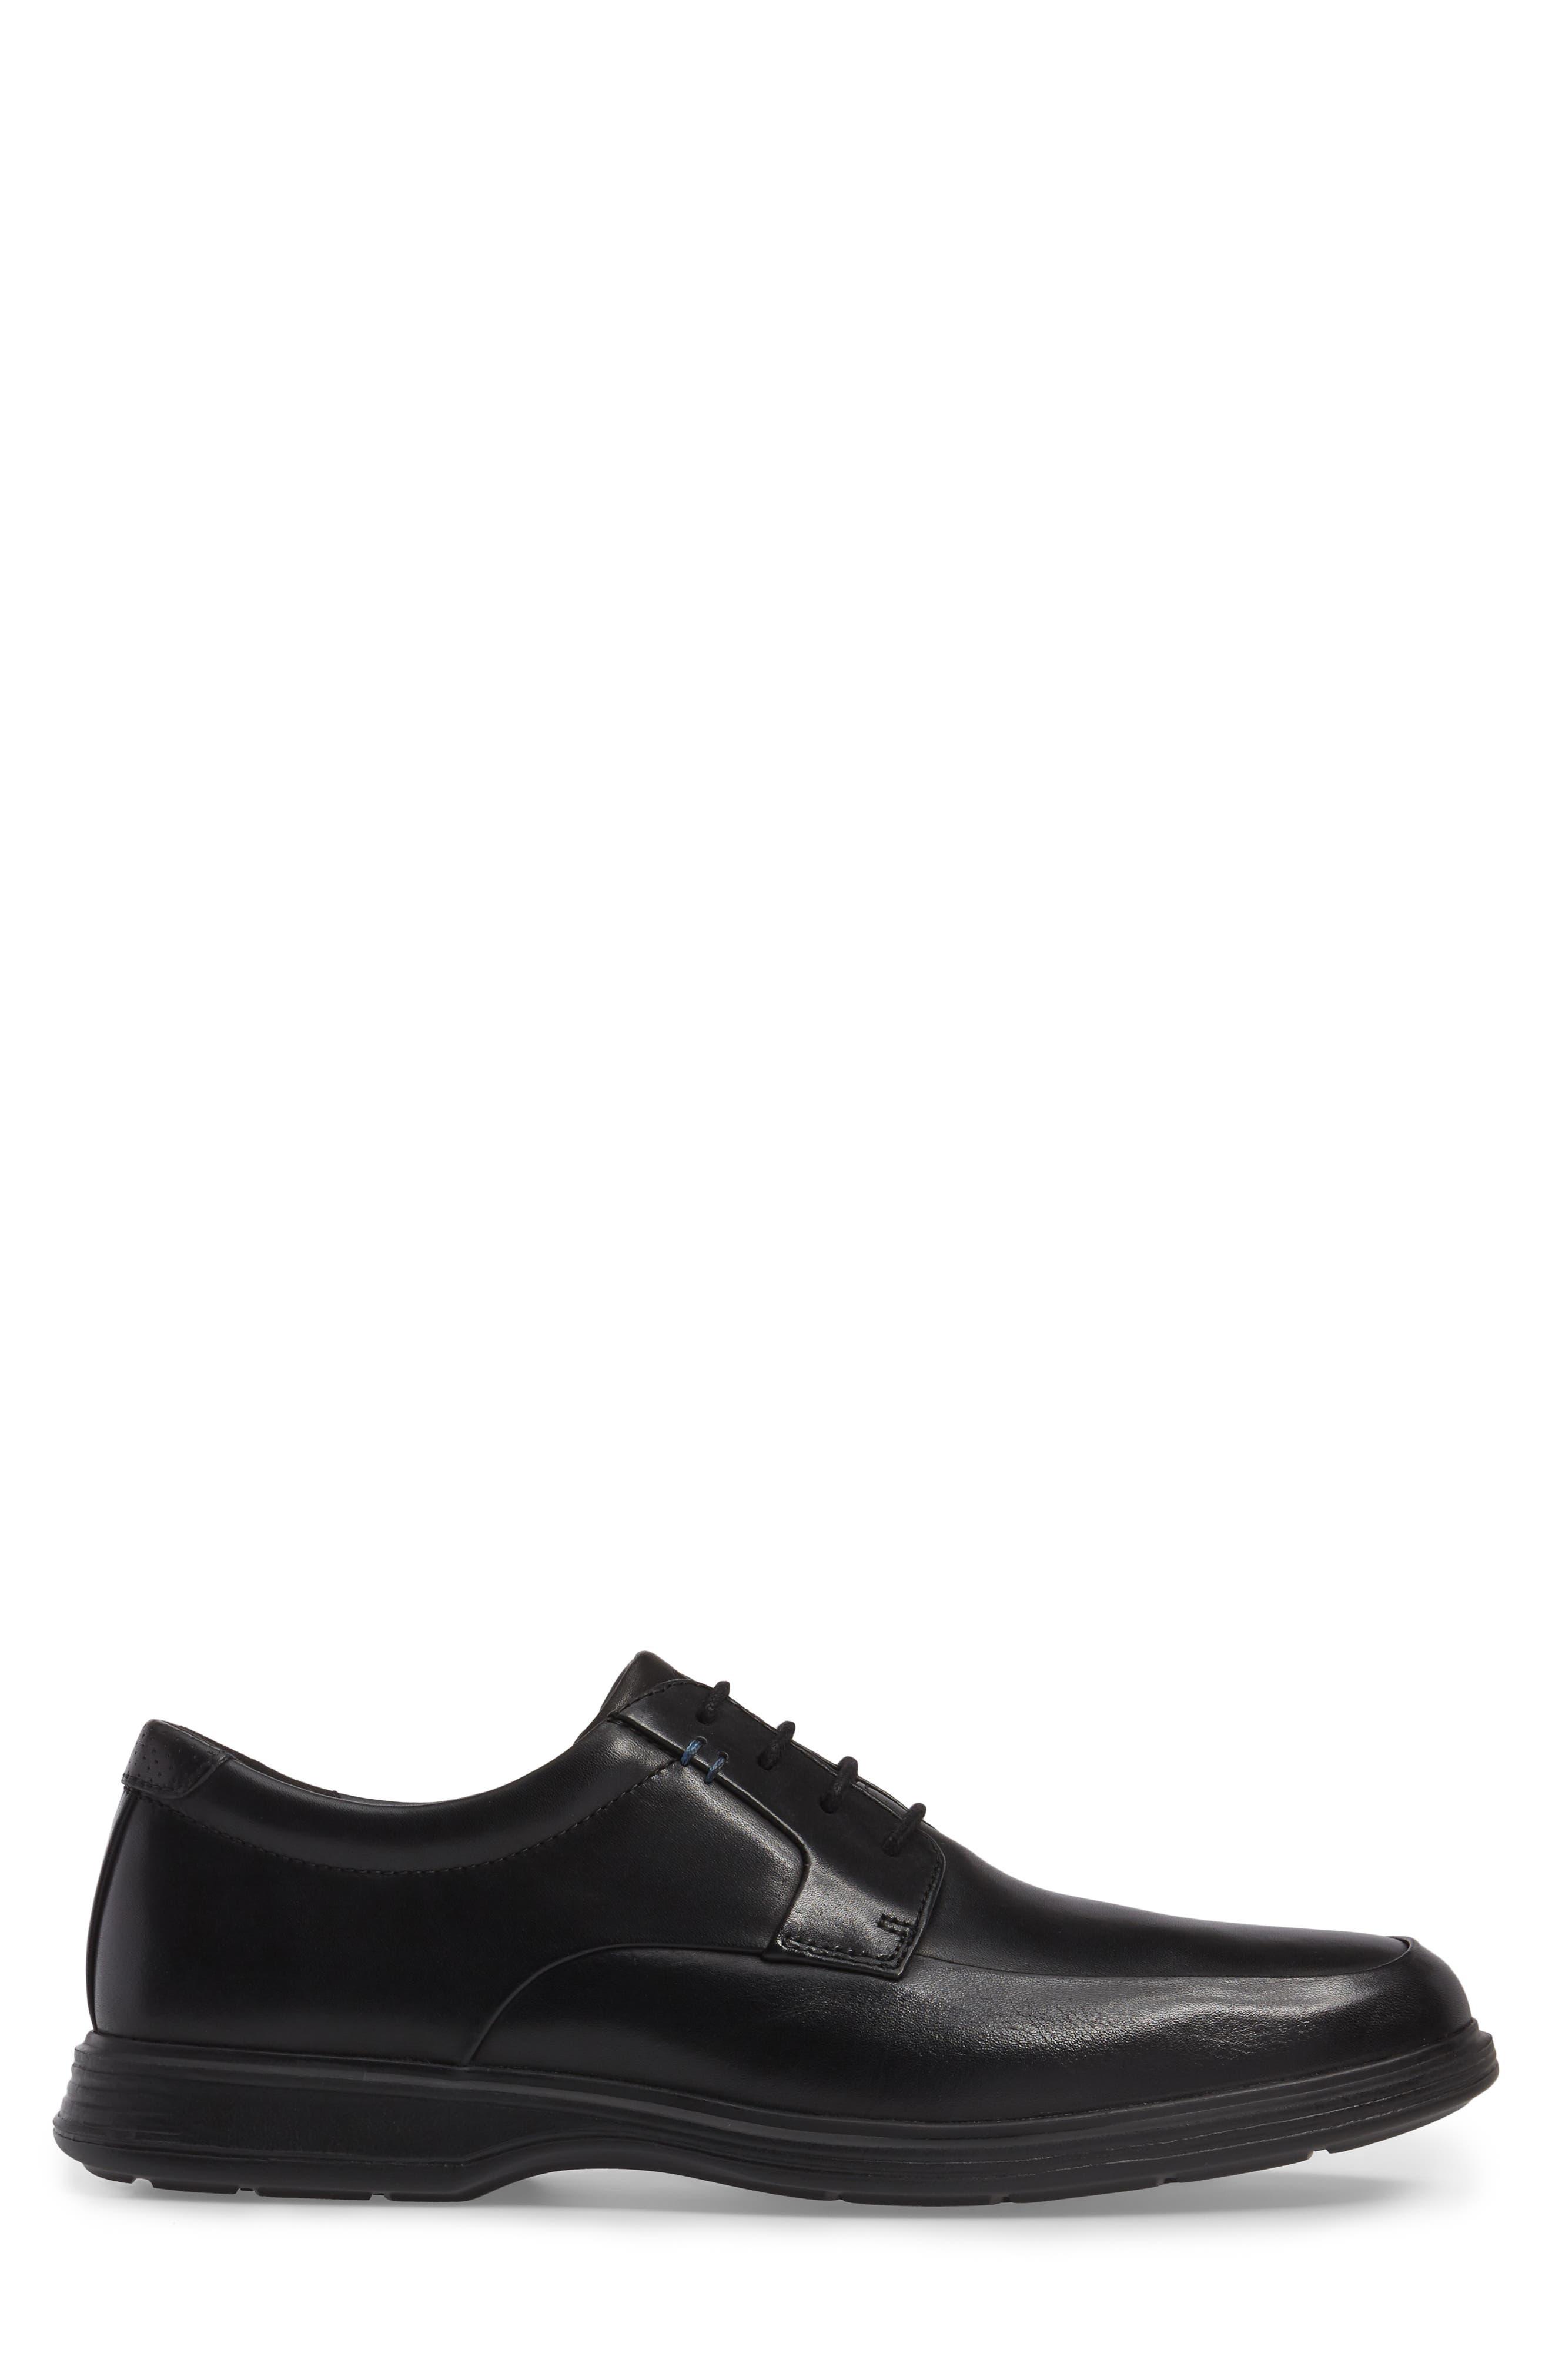 DresSports 2 Lite Apron Toe Derby,                             Alternate thumbnail 3, color,                             Black Leather